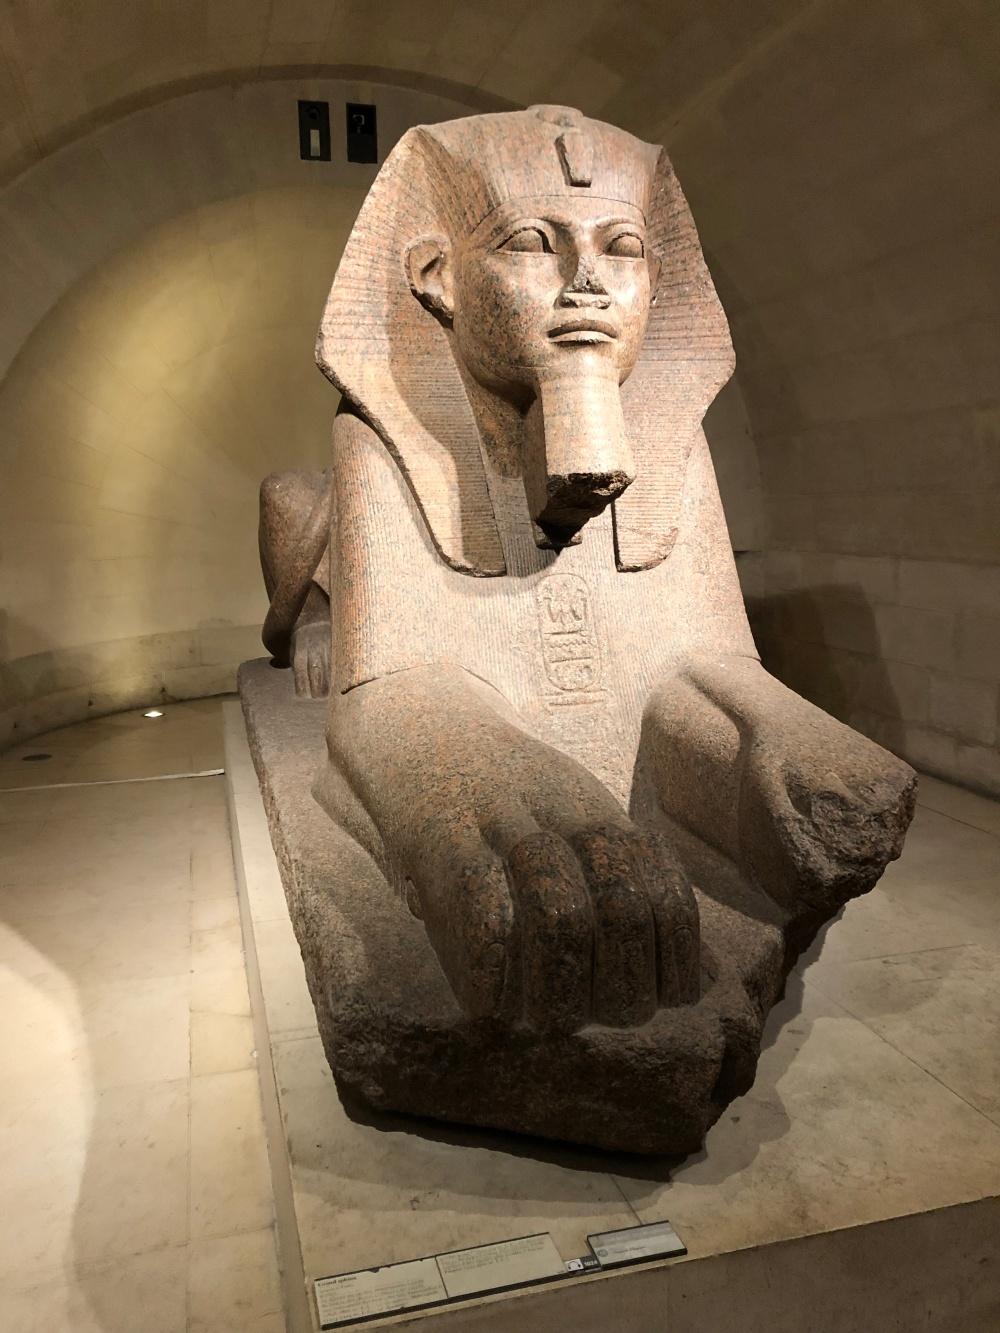 Paris - Jenny Rojas Apr19 - Jennyskyisthelimit - The Louvre Museum (43) - The Sphinx